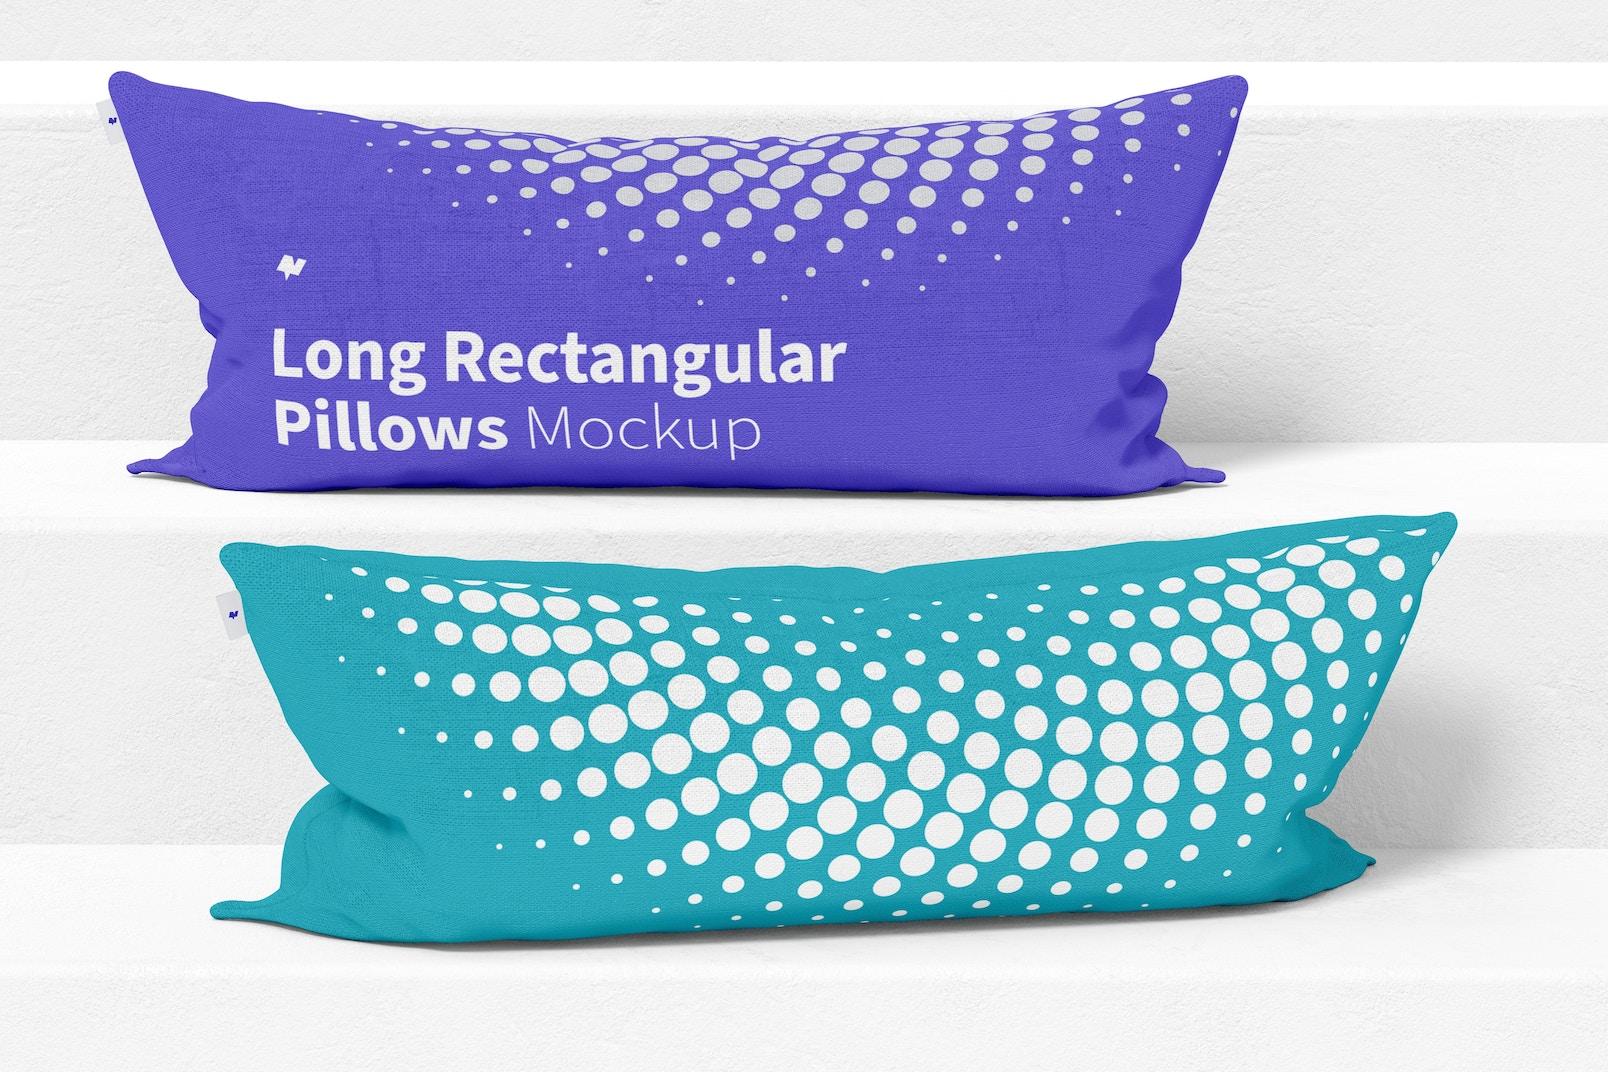 Long Rectangular Pillows Mockup, Front View